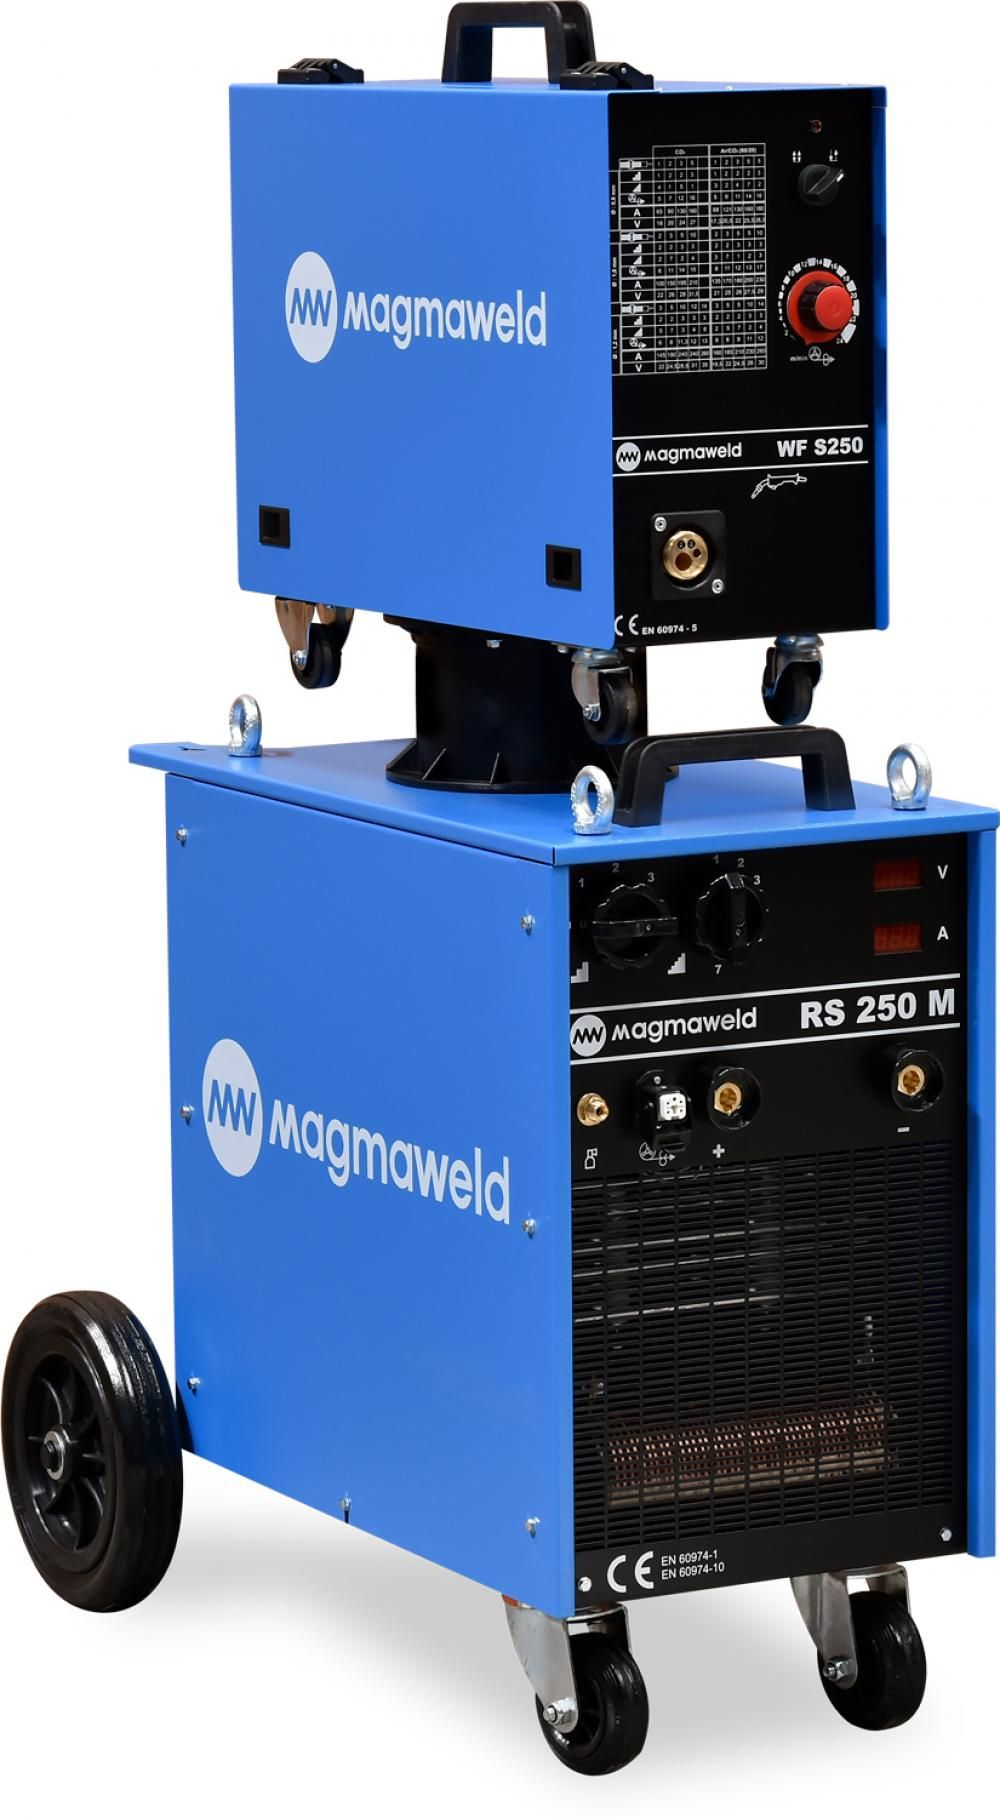 Magmaweld RS 250 M-5